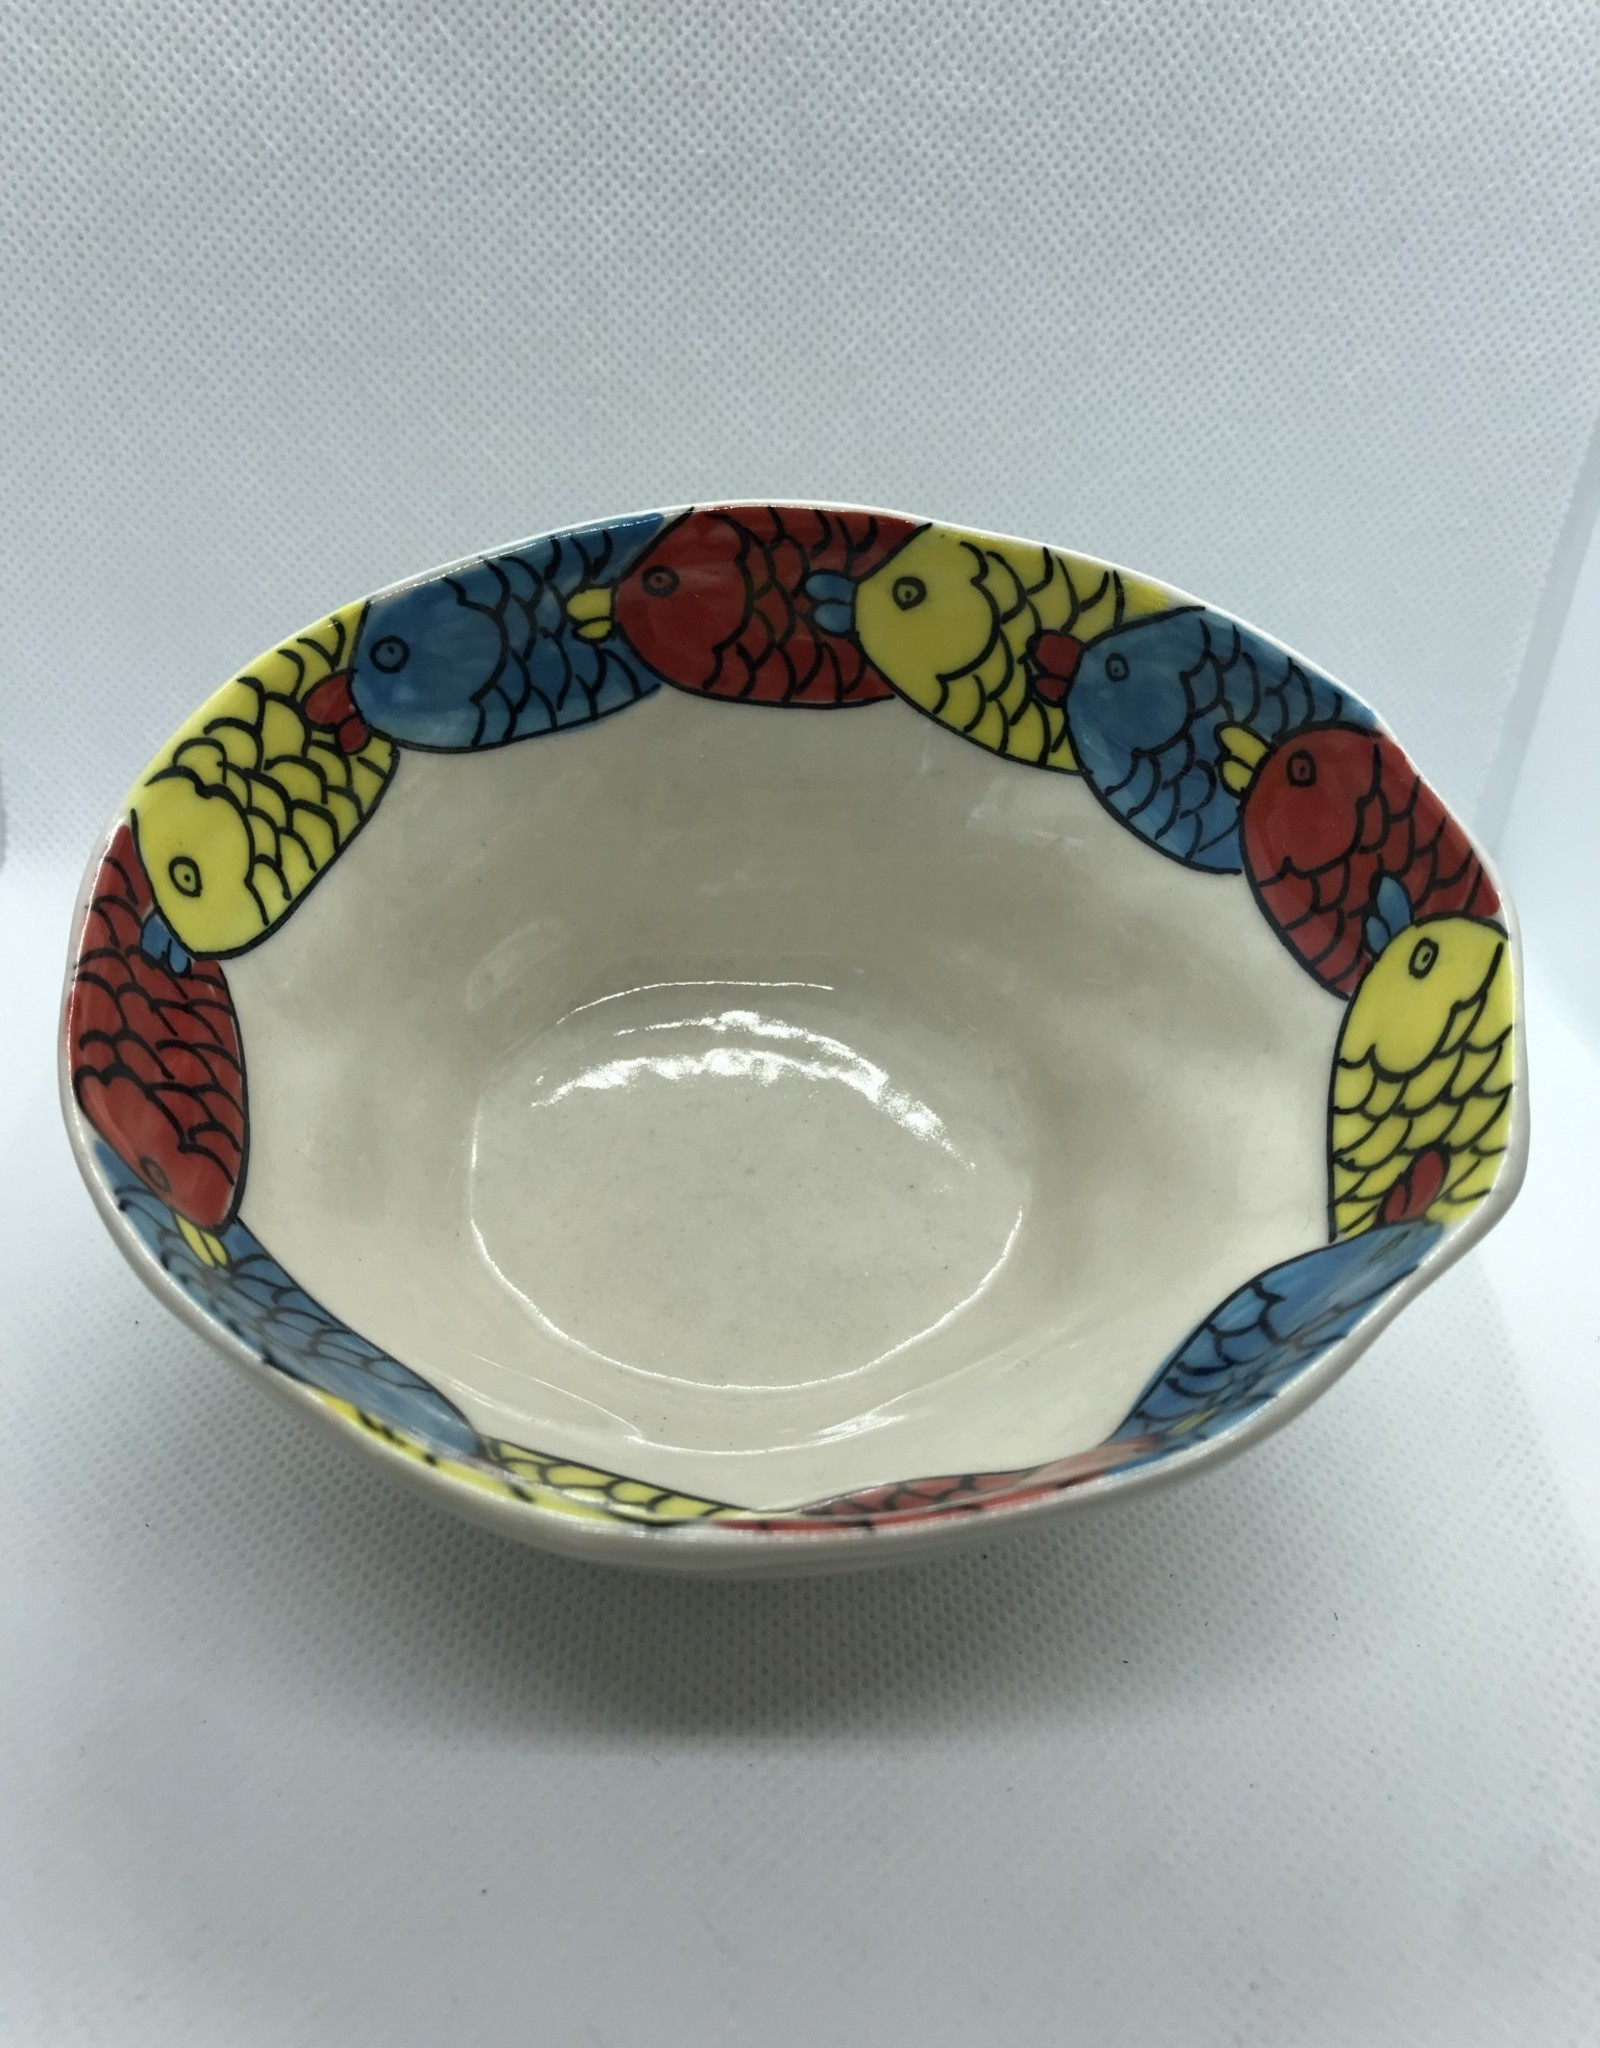 Small ceramic bowl, fish